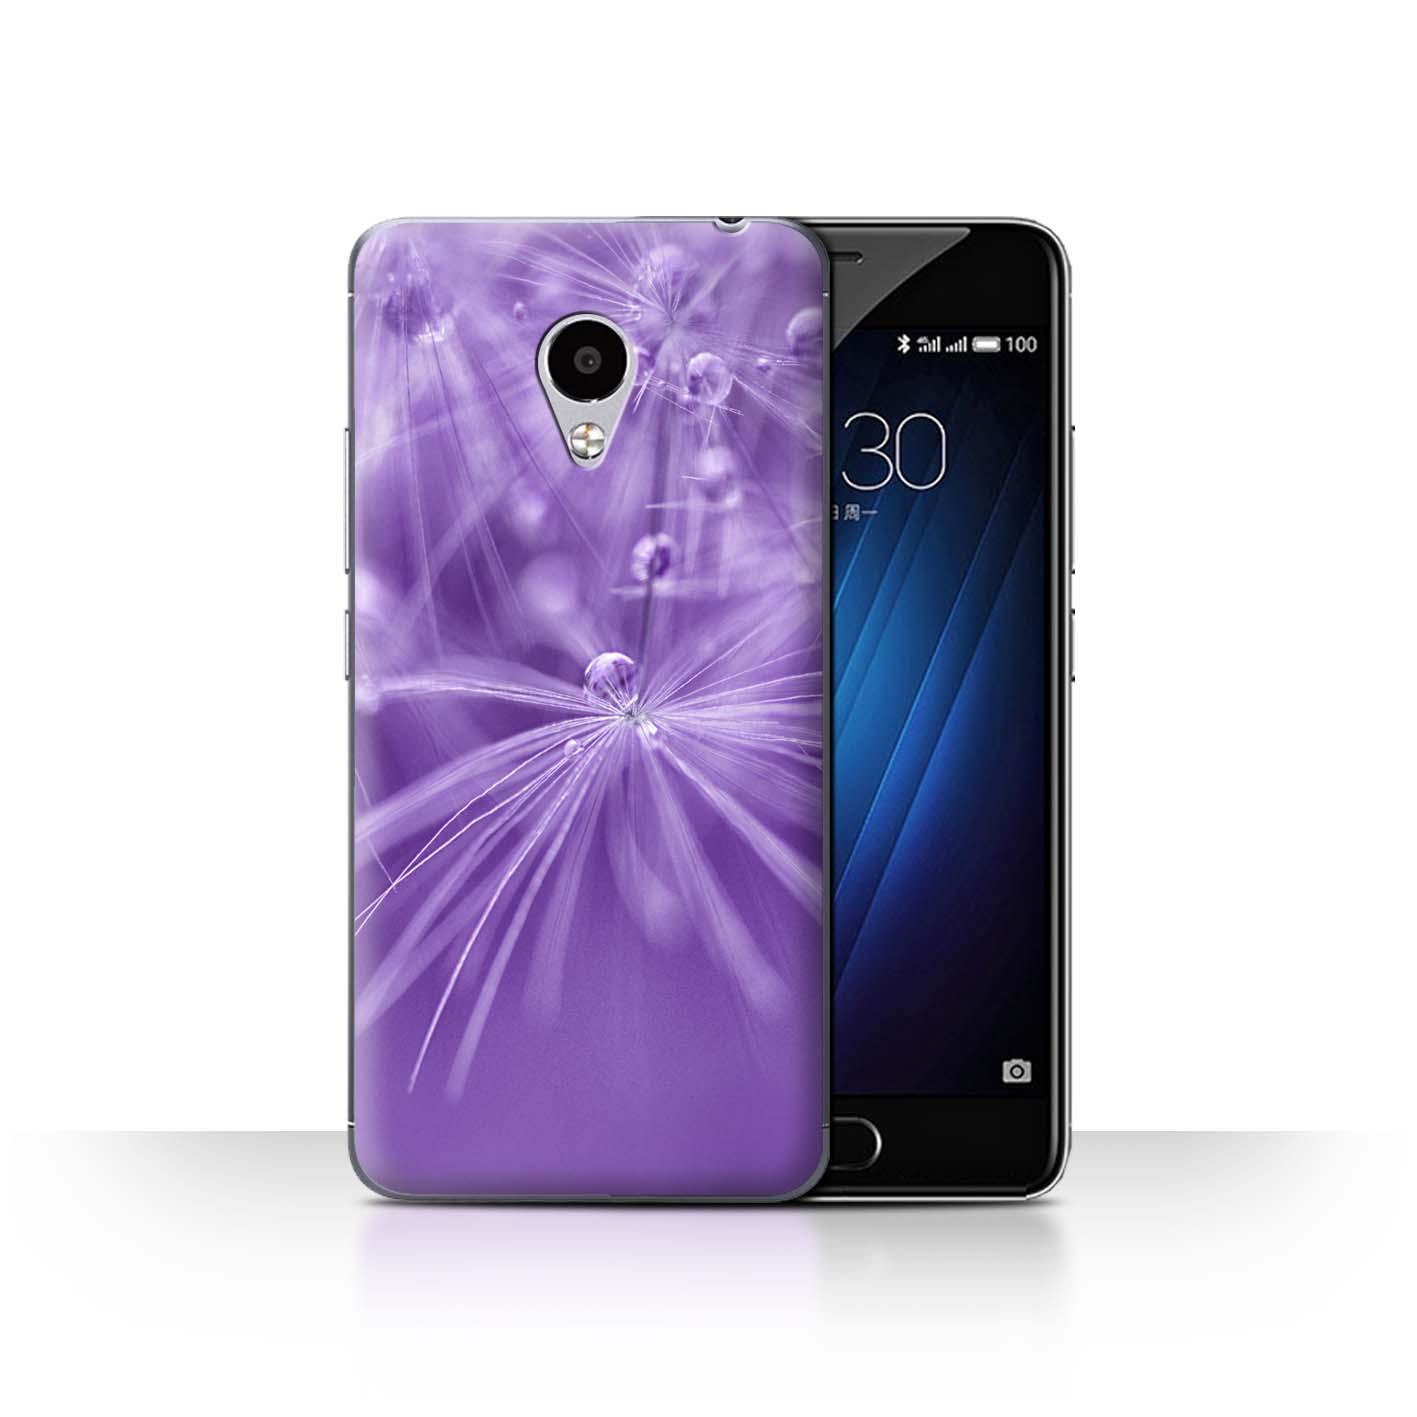 STUFF4-Back-Case-Cover-Skin-for-Meizu-M3S-Floral-Fairy-Drops